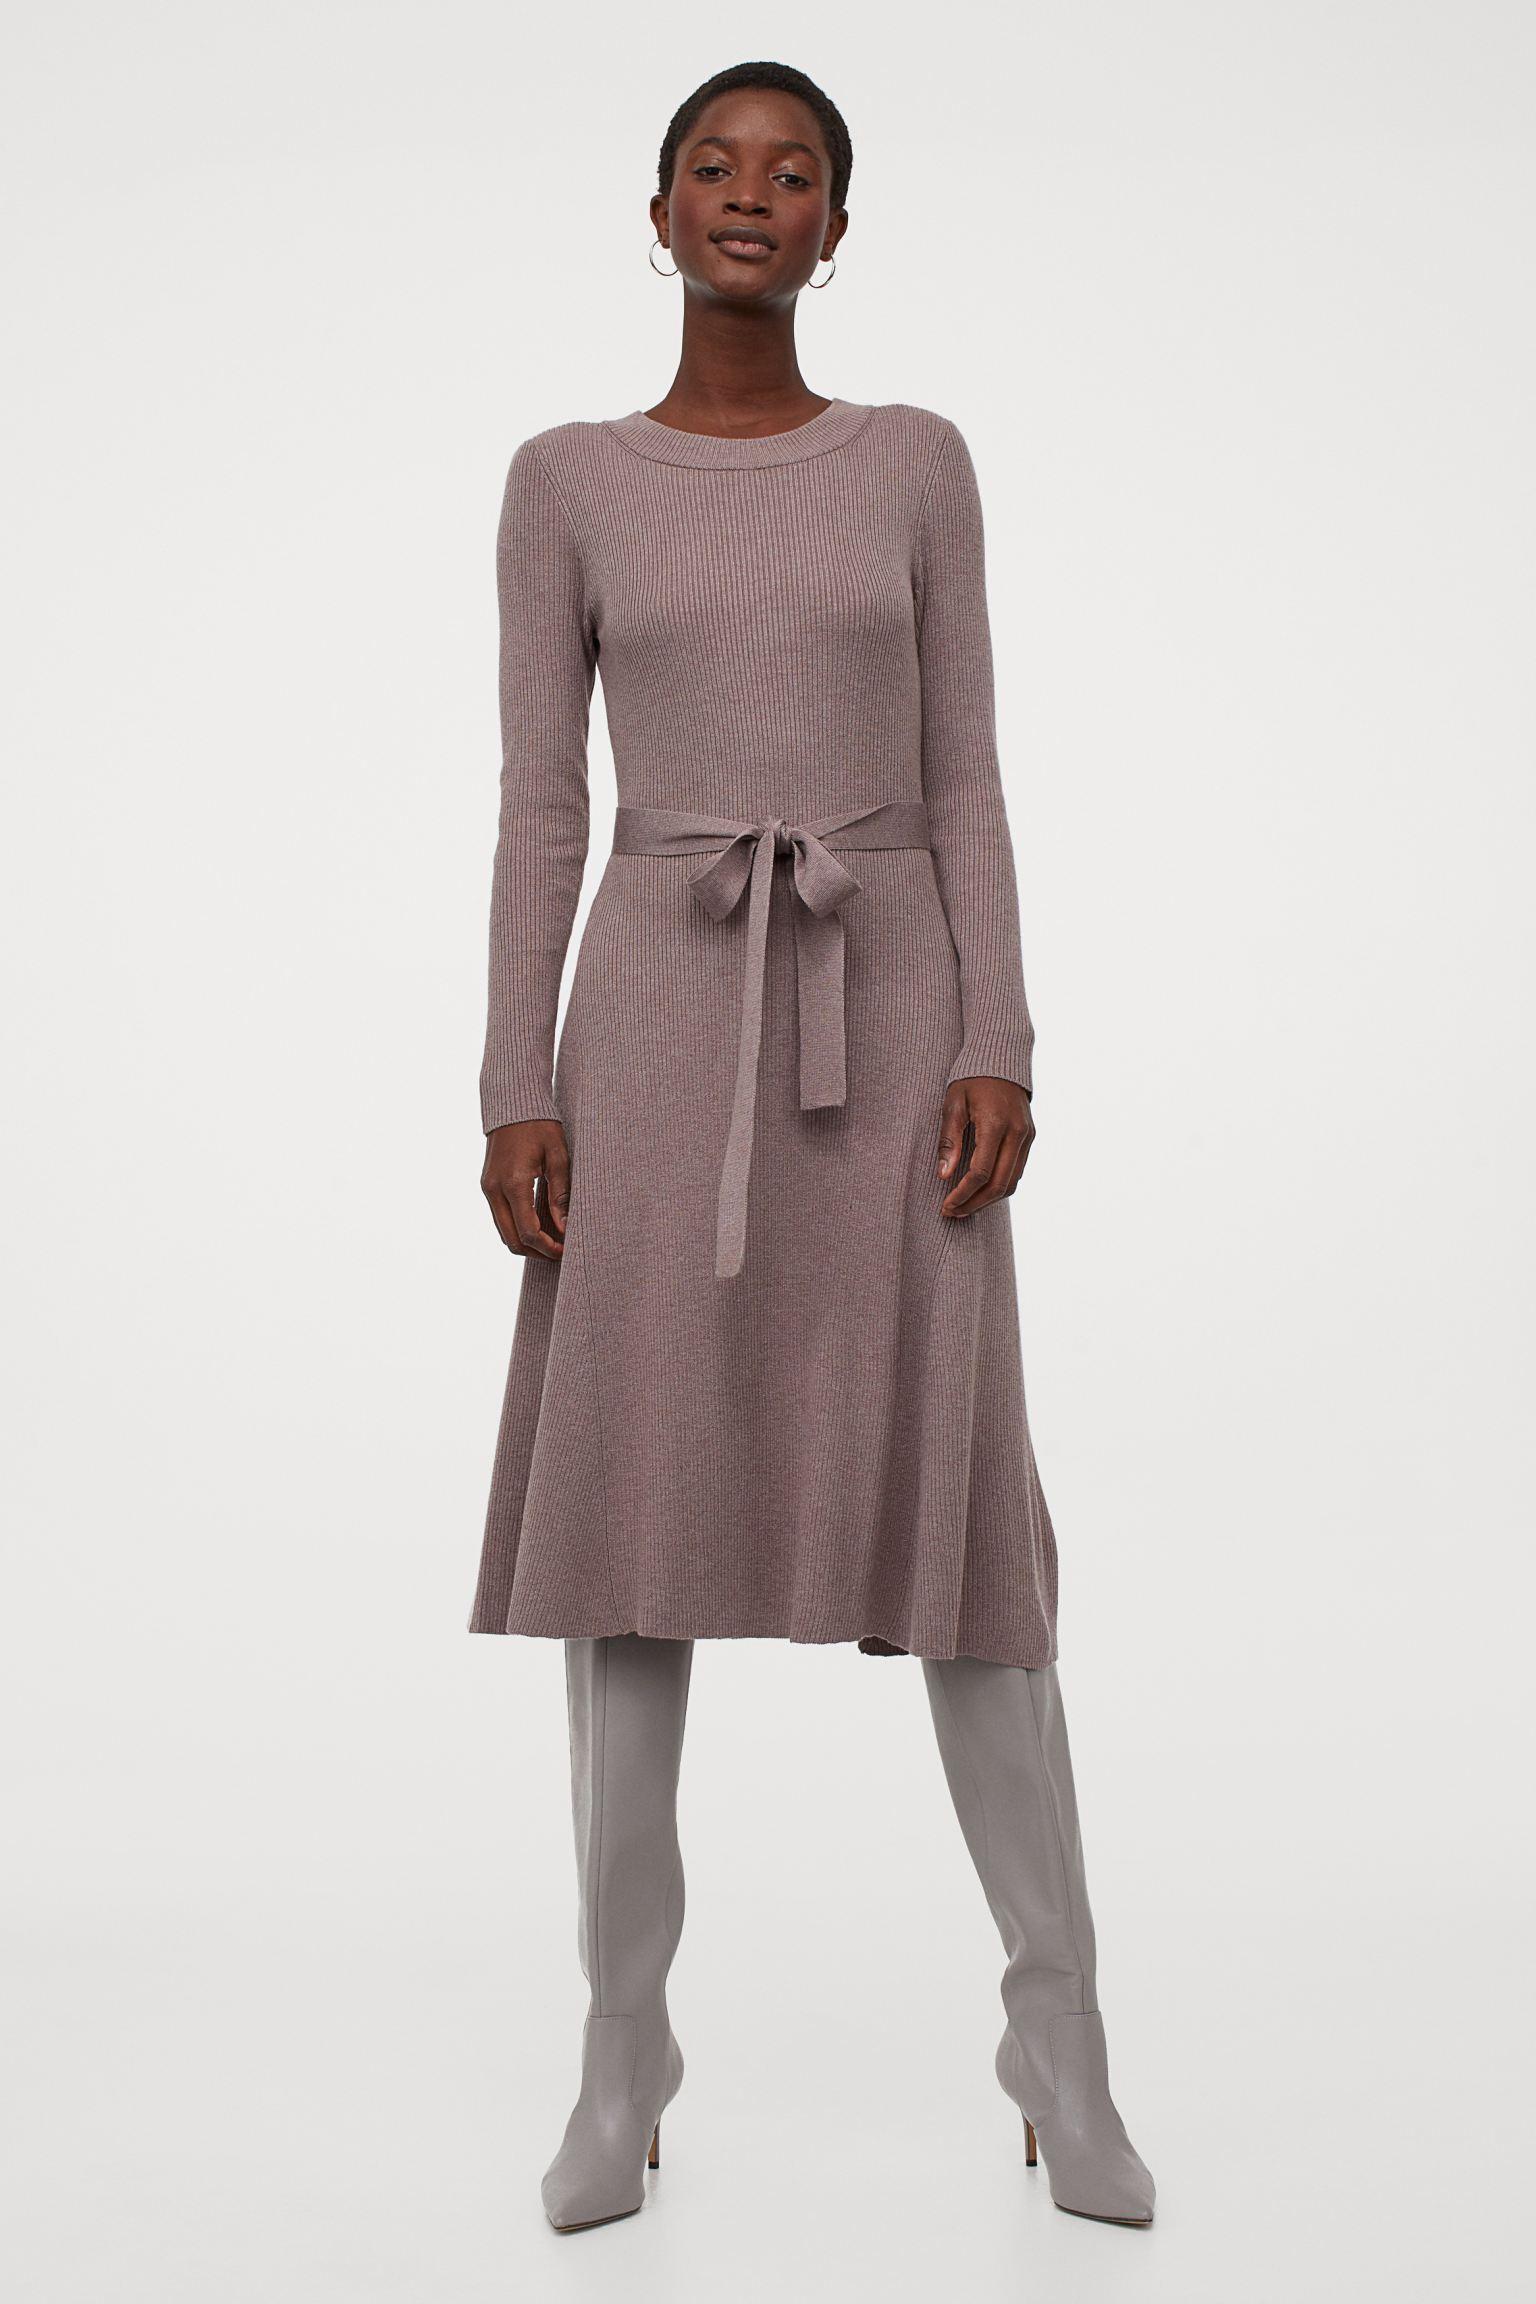 Vestido de manga larga en punto de canalé suave con cinturón de anudar extraíble